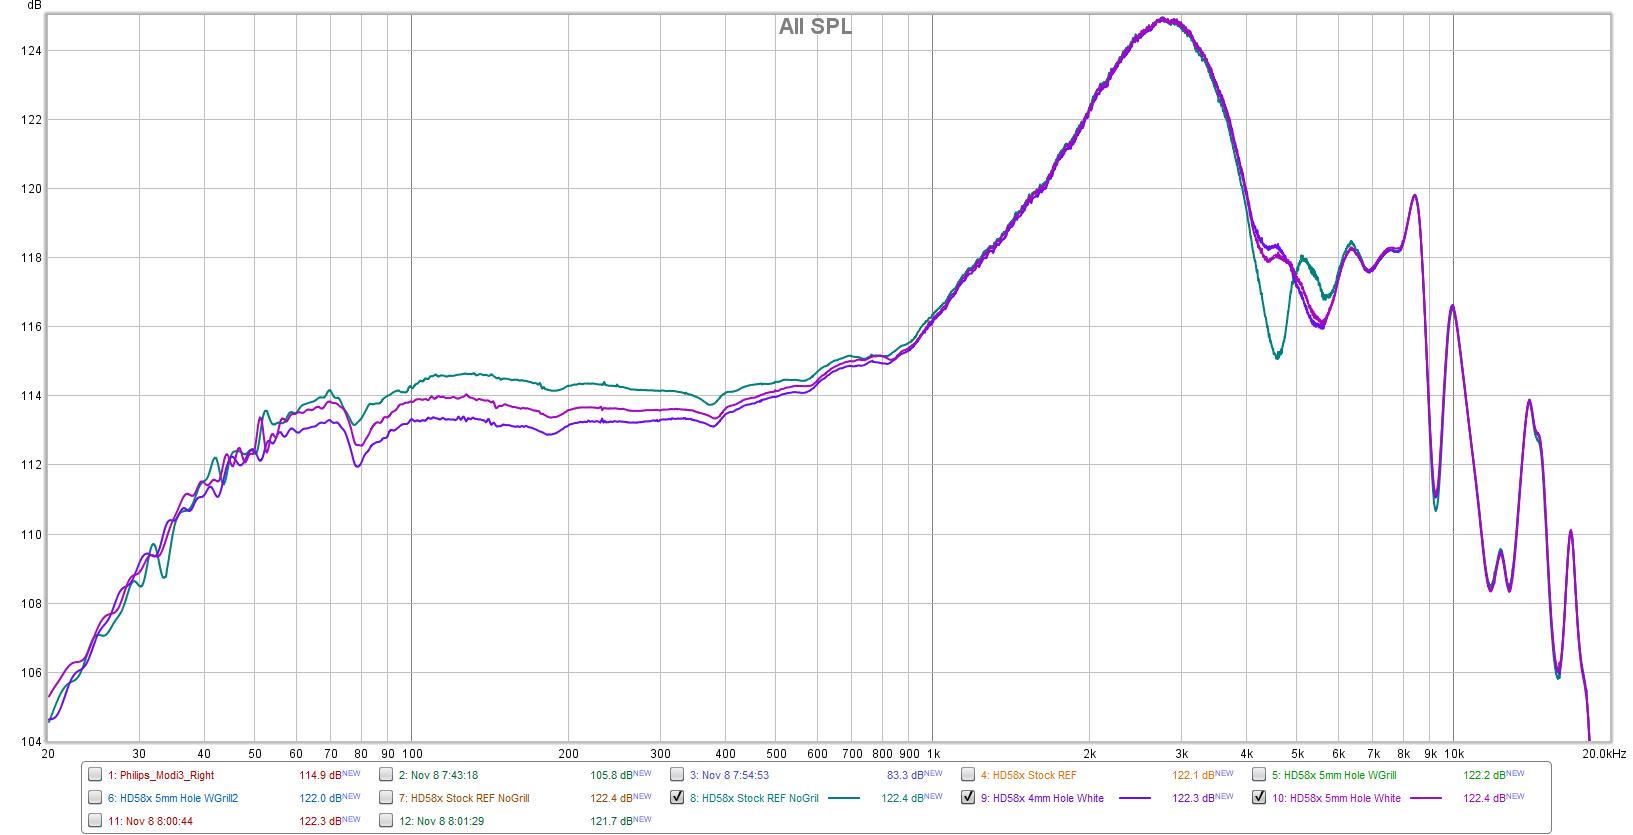 HD58x_Fresp_Stock_4mm_5mm.png